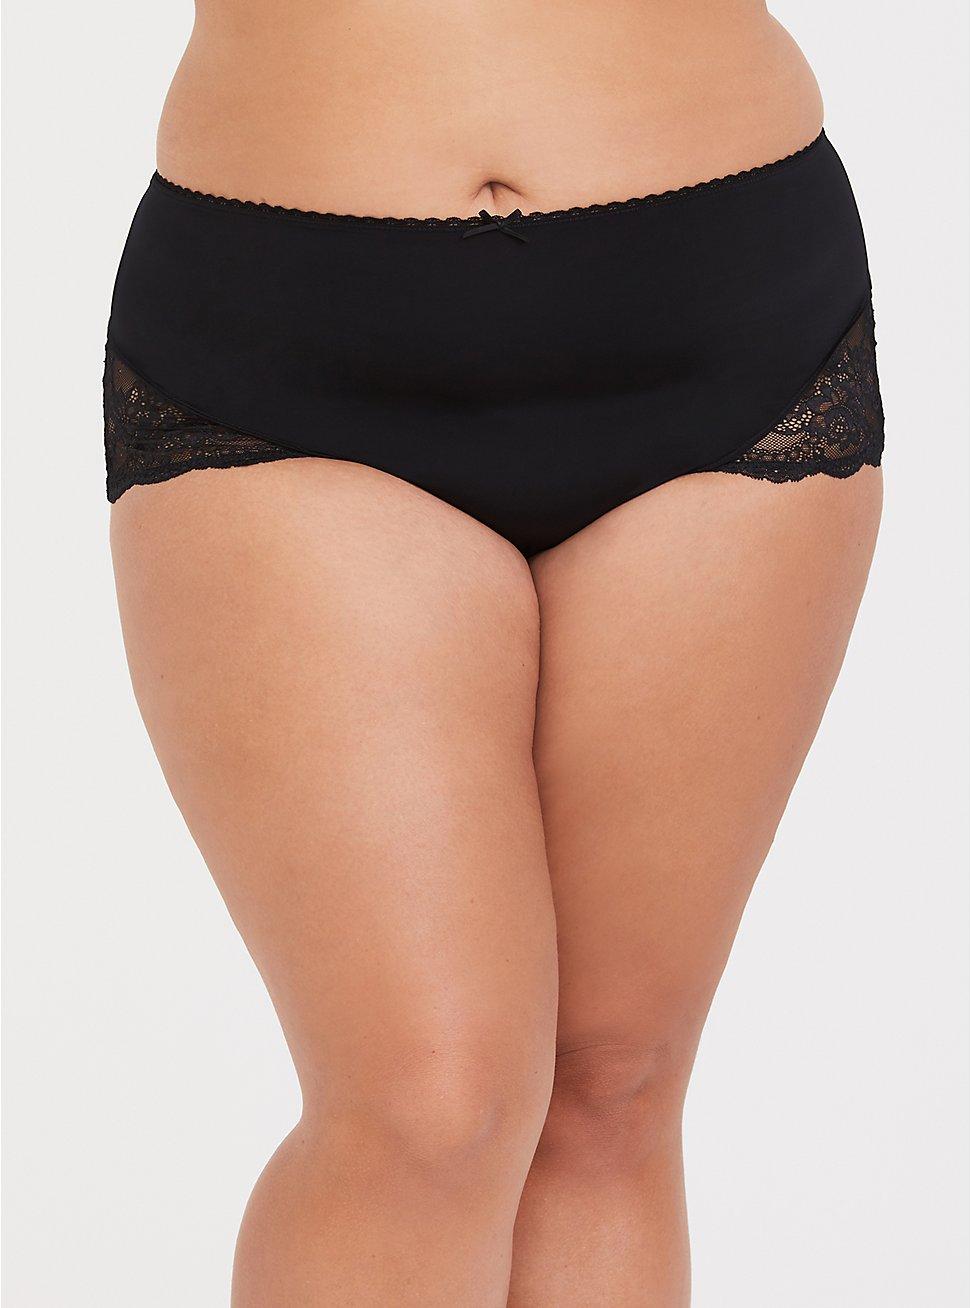 Torrid Curve Body™ Microfiber & Lace Sexy Brief, RICH BLACK, hi-res